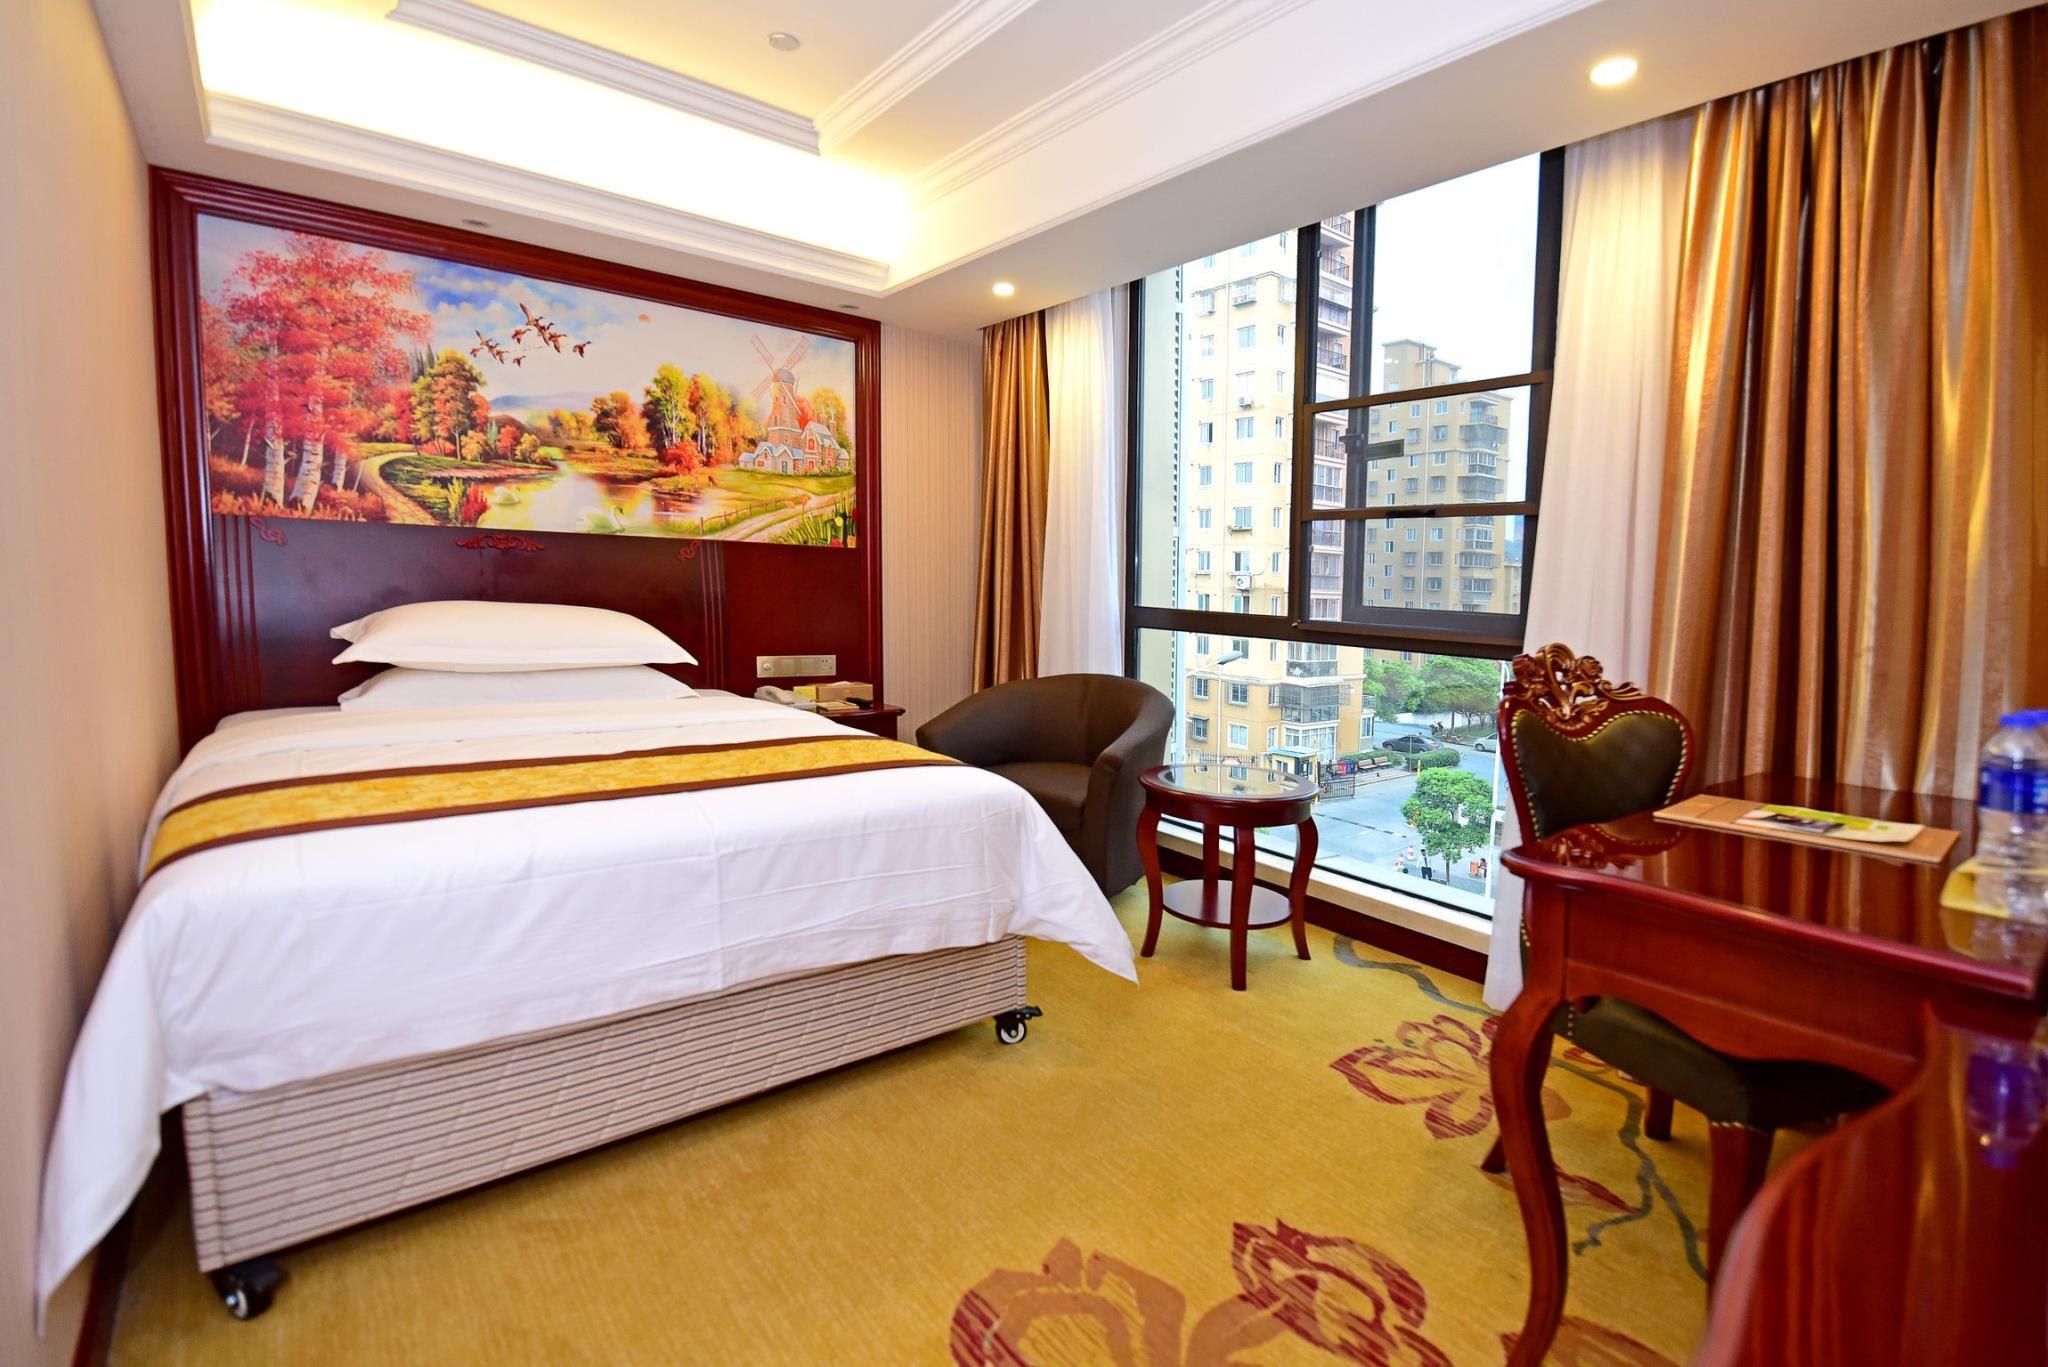 Vienna Hotel Shanghai Pudong Airport Heqing Branch Reviews